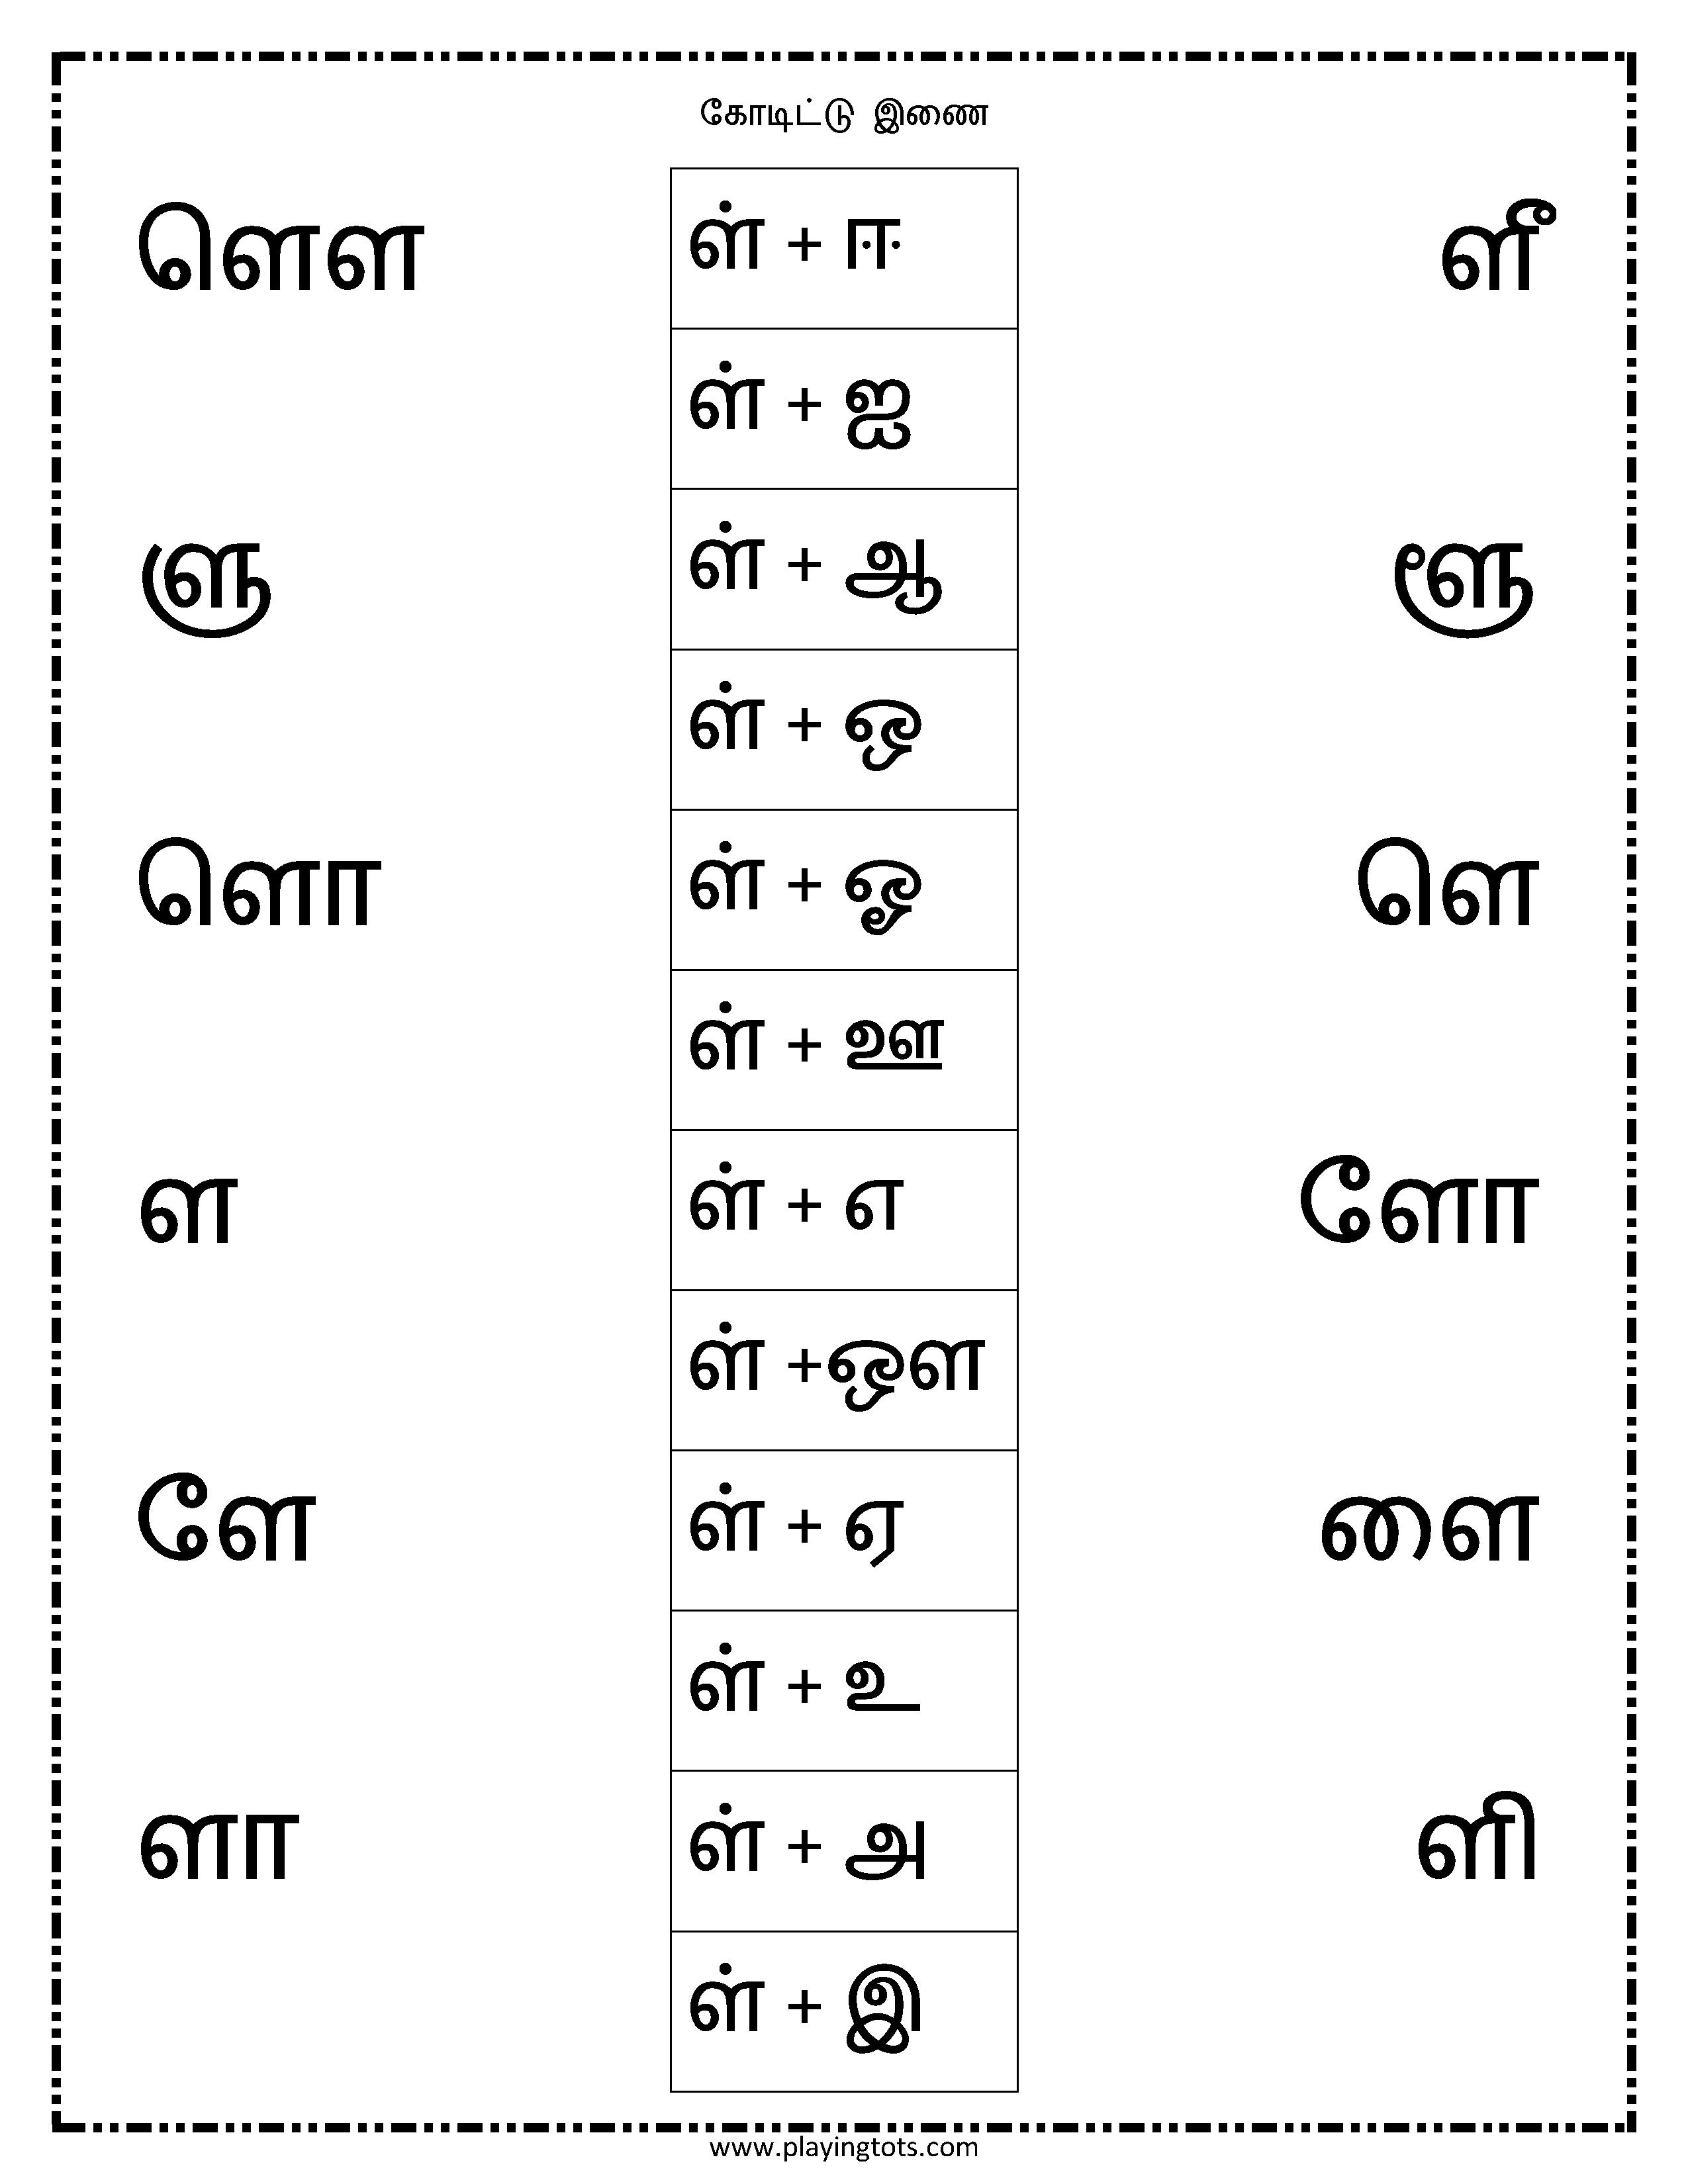 Pin By Eswarirajbarath On Tamil Worksheets G1